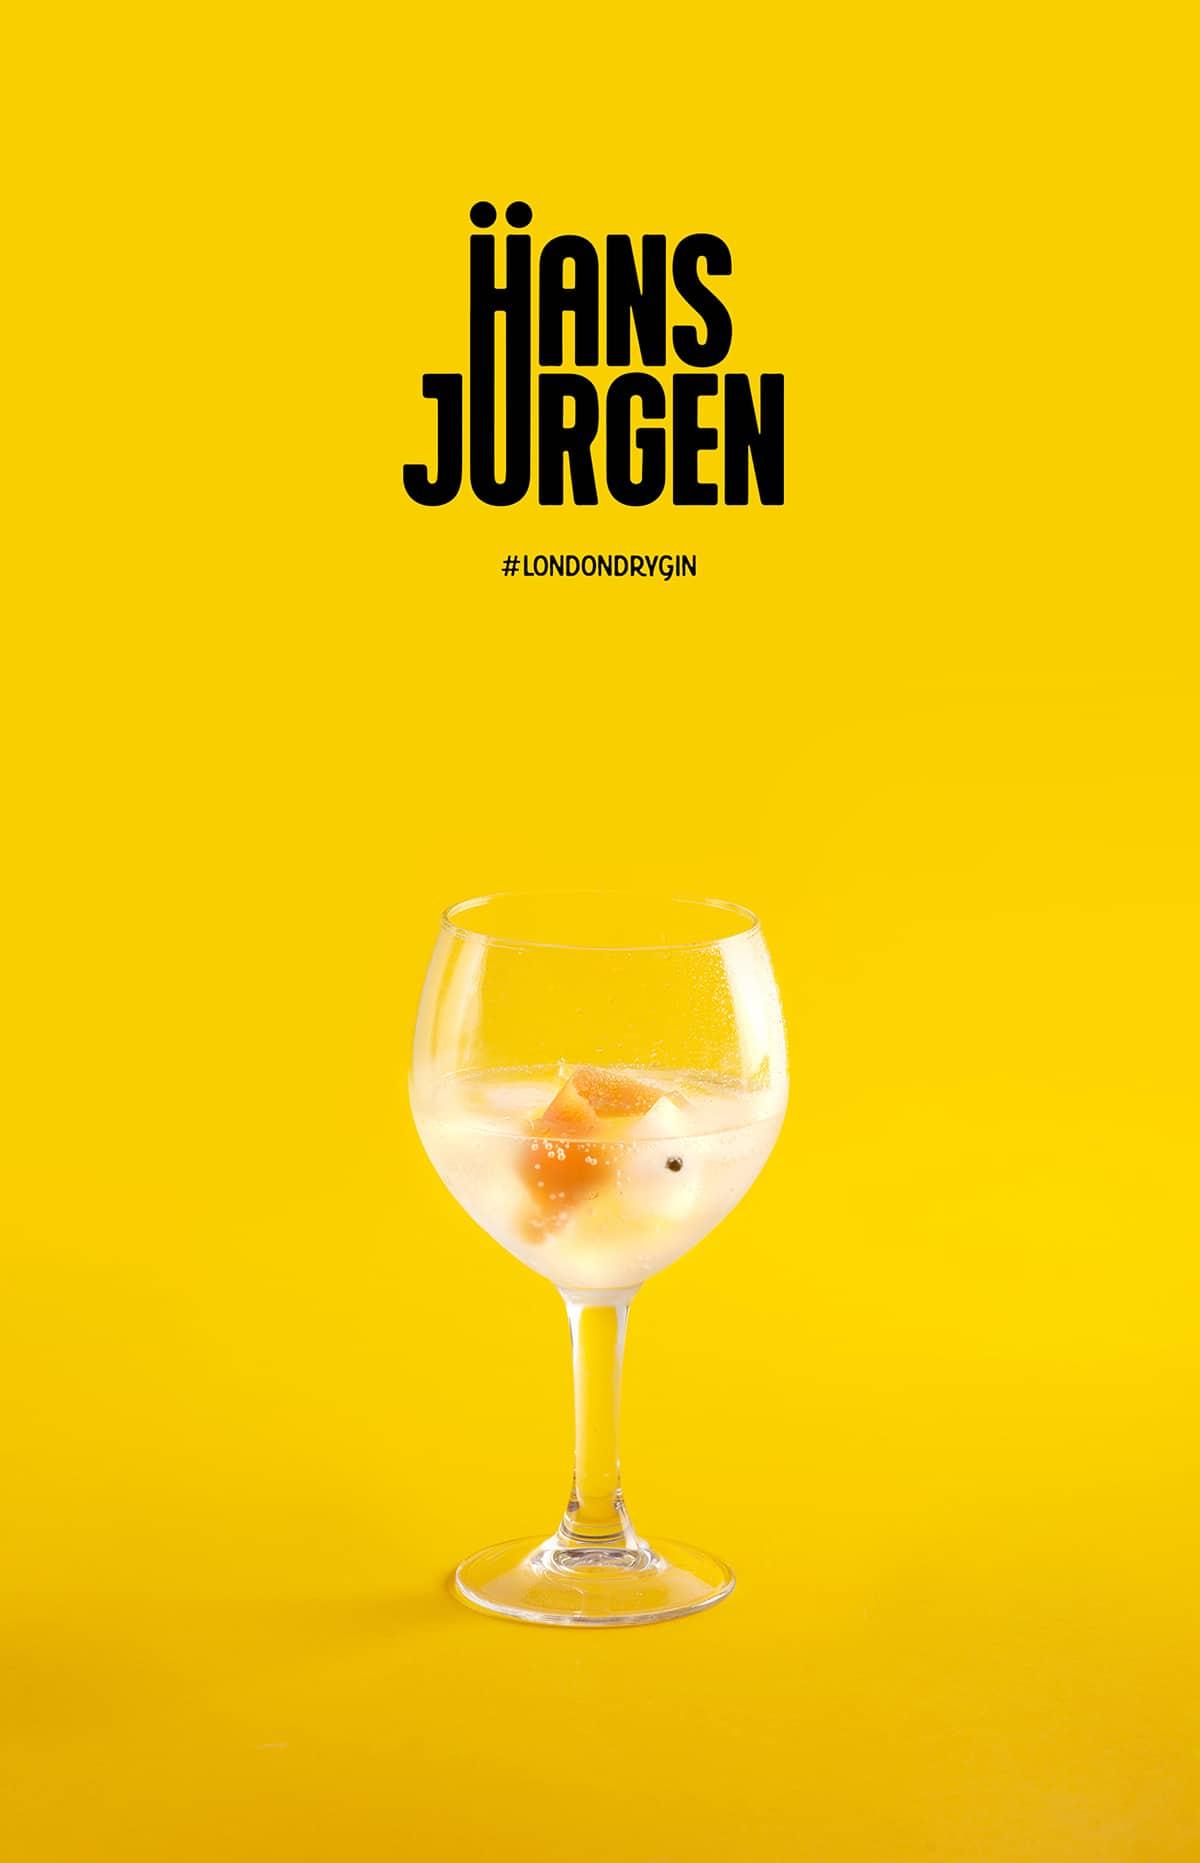 Hans Jürgen Heisszeit Gin Tonic Sommer